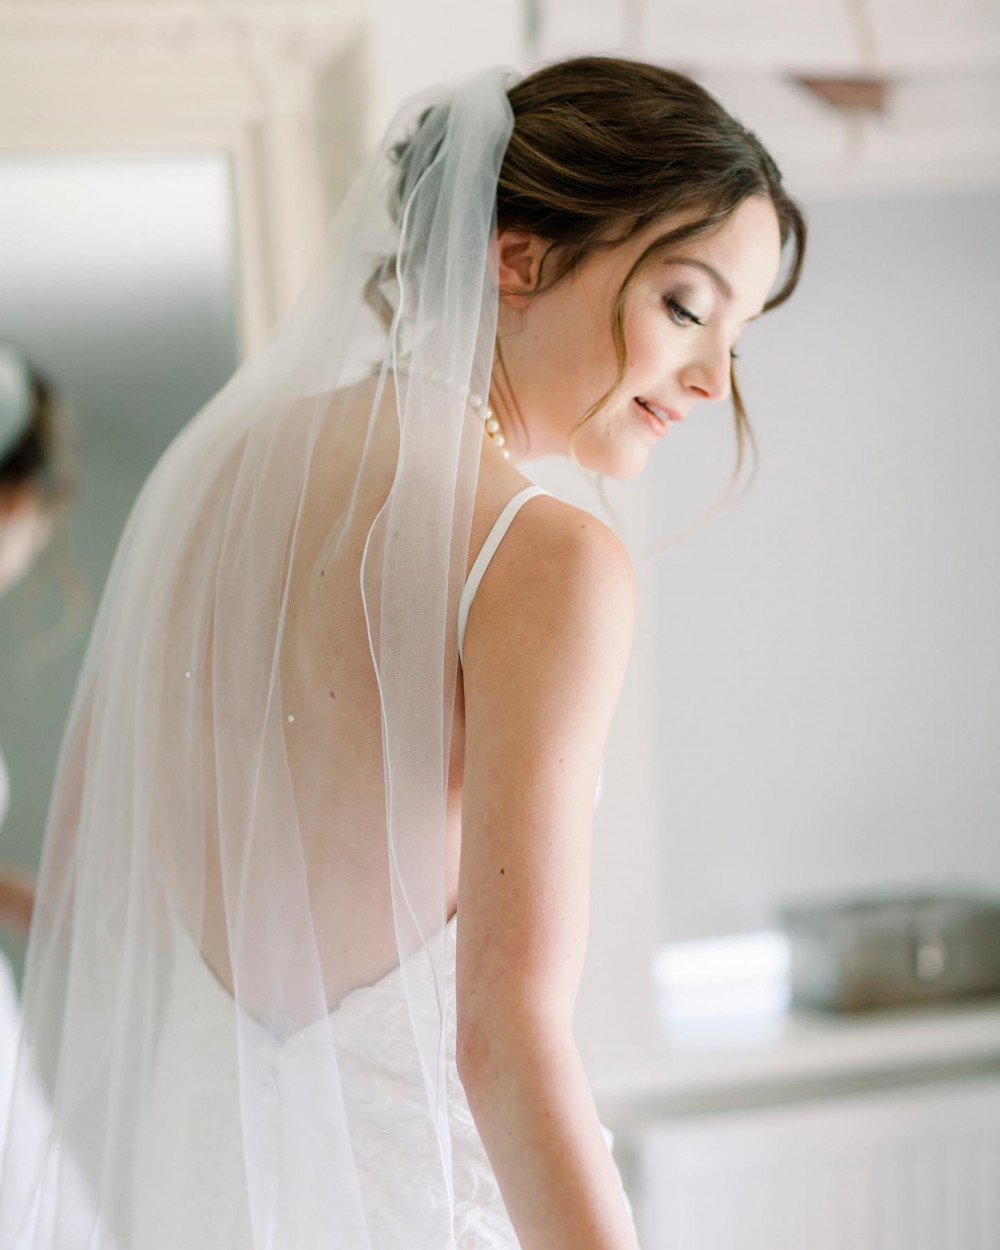 - Make Me Bridal Artist: Powder & Paint - Makeup by Kathryn. Photography by: Jo Bradbury. #classic #naturalmakeup #bridalmakeup #soft #pretty #freshfaced #charlottetilbury #summer #cotswoldsmakeupartist #cotswoldwedding